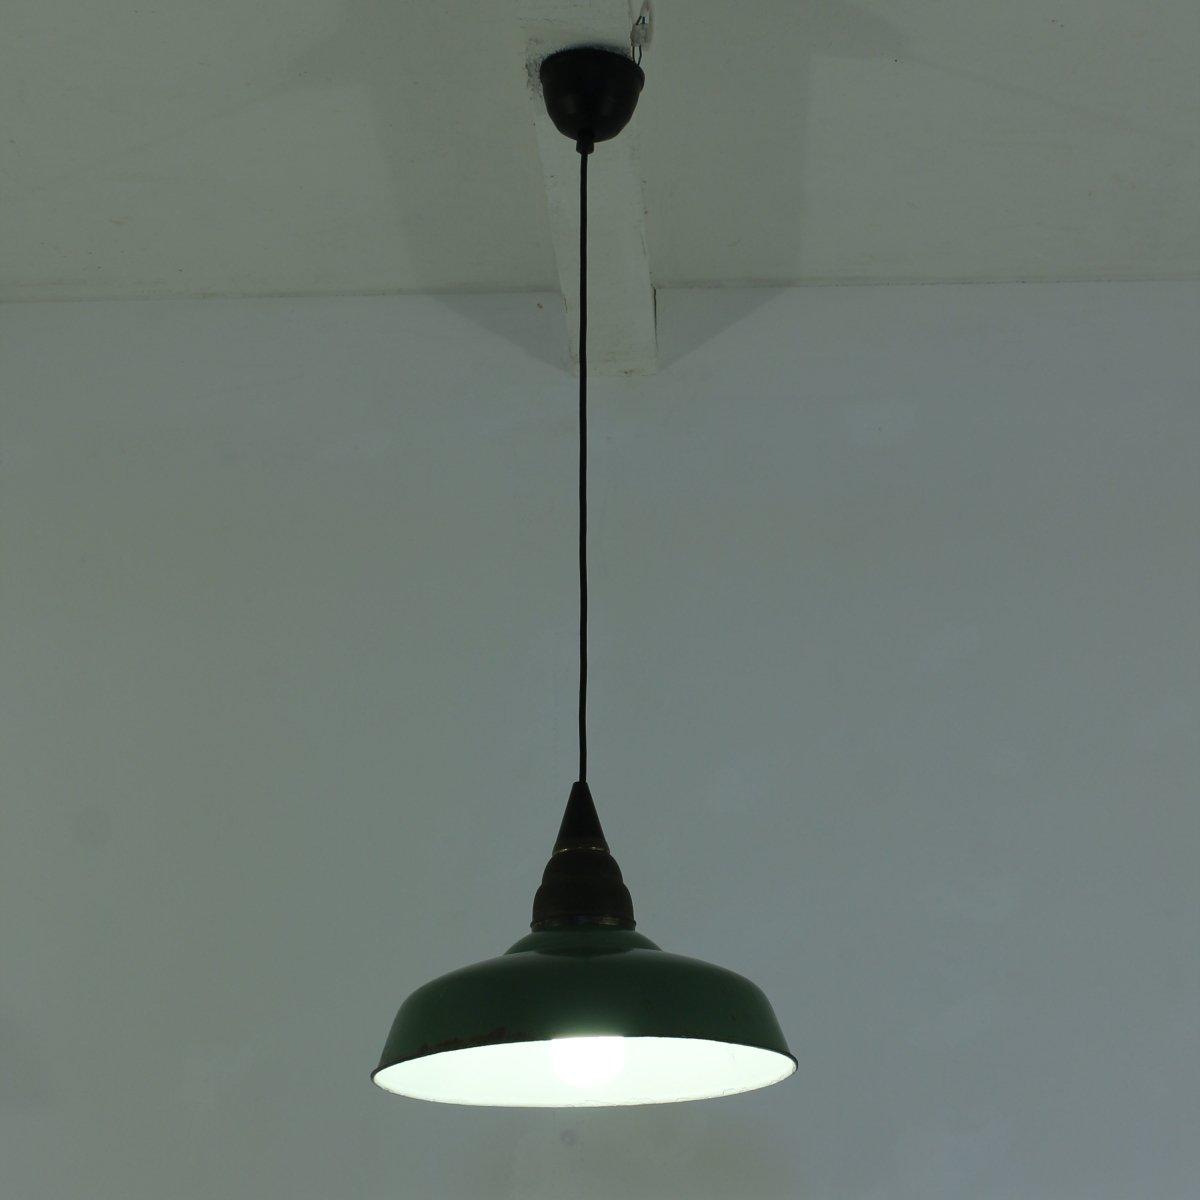 lampe suspension d 39 atelier vintage industrielle verte. Black Bedroom Furniture Sets. Home Design Ideas